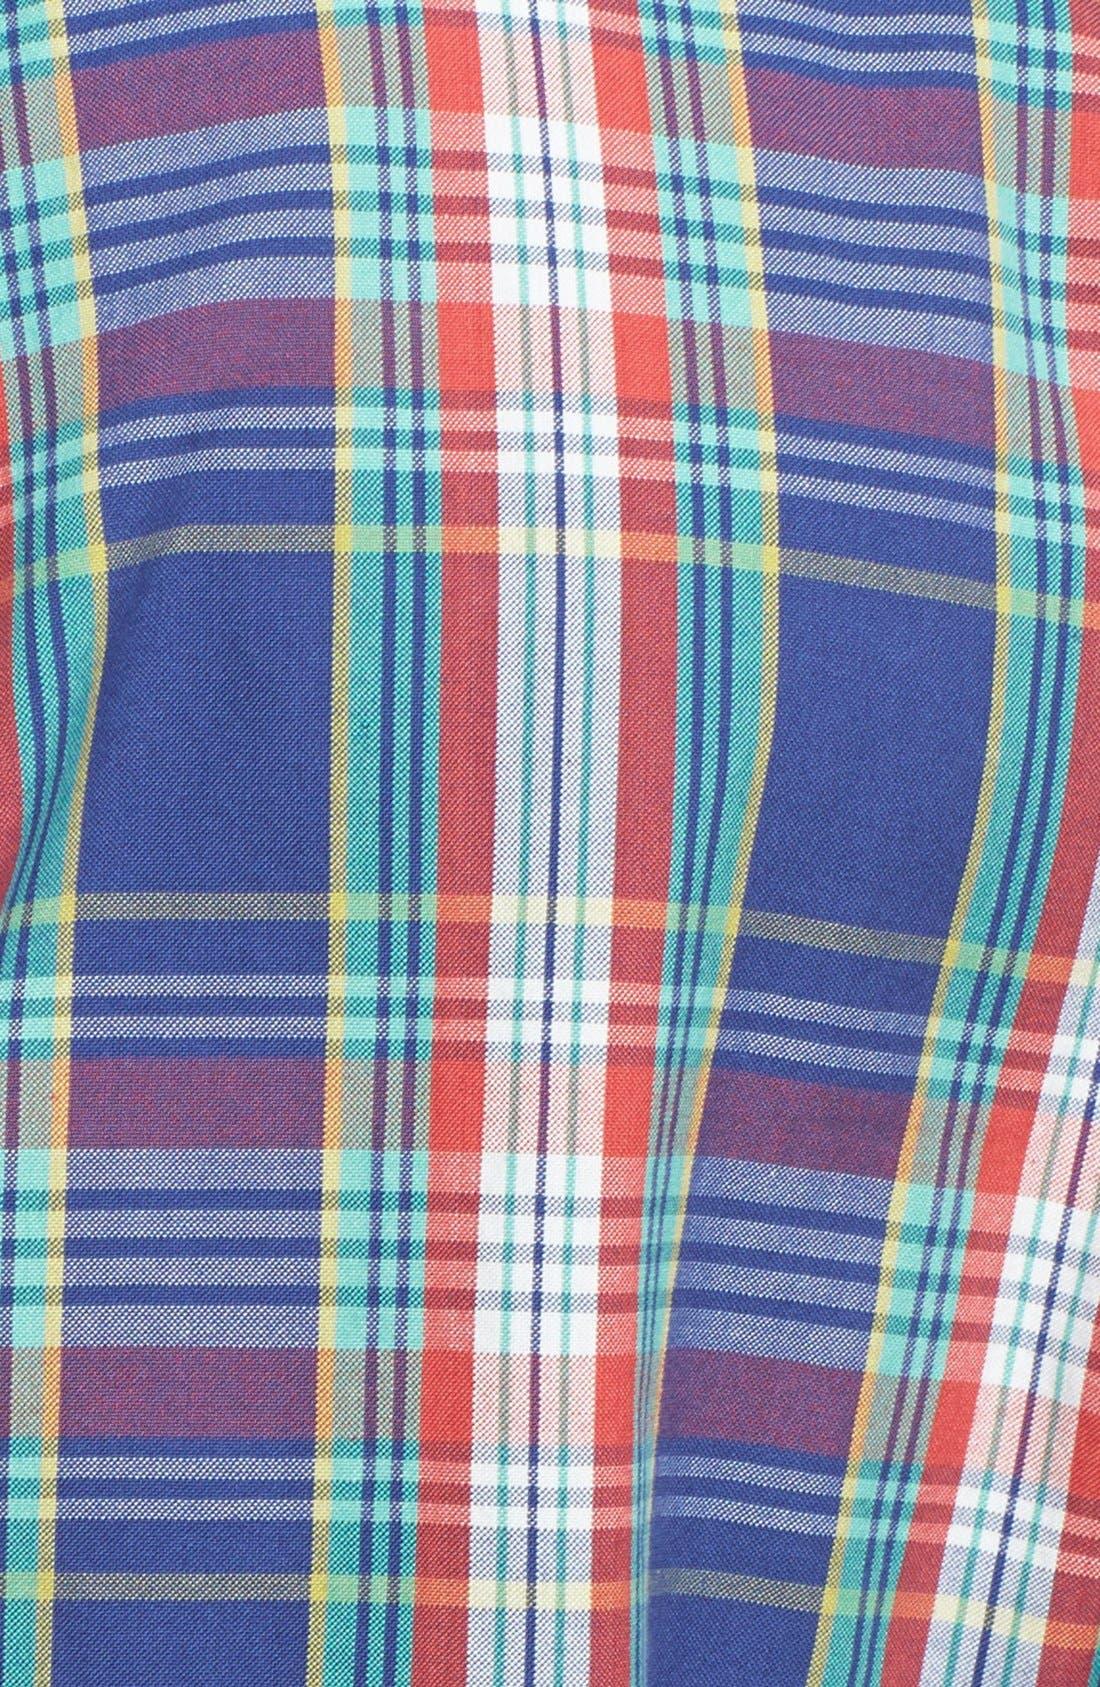 Alternate Image 3  - Gant Rugger 'Dreamy' Plaid Oxford Shirt